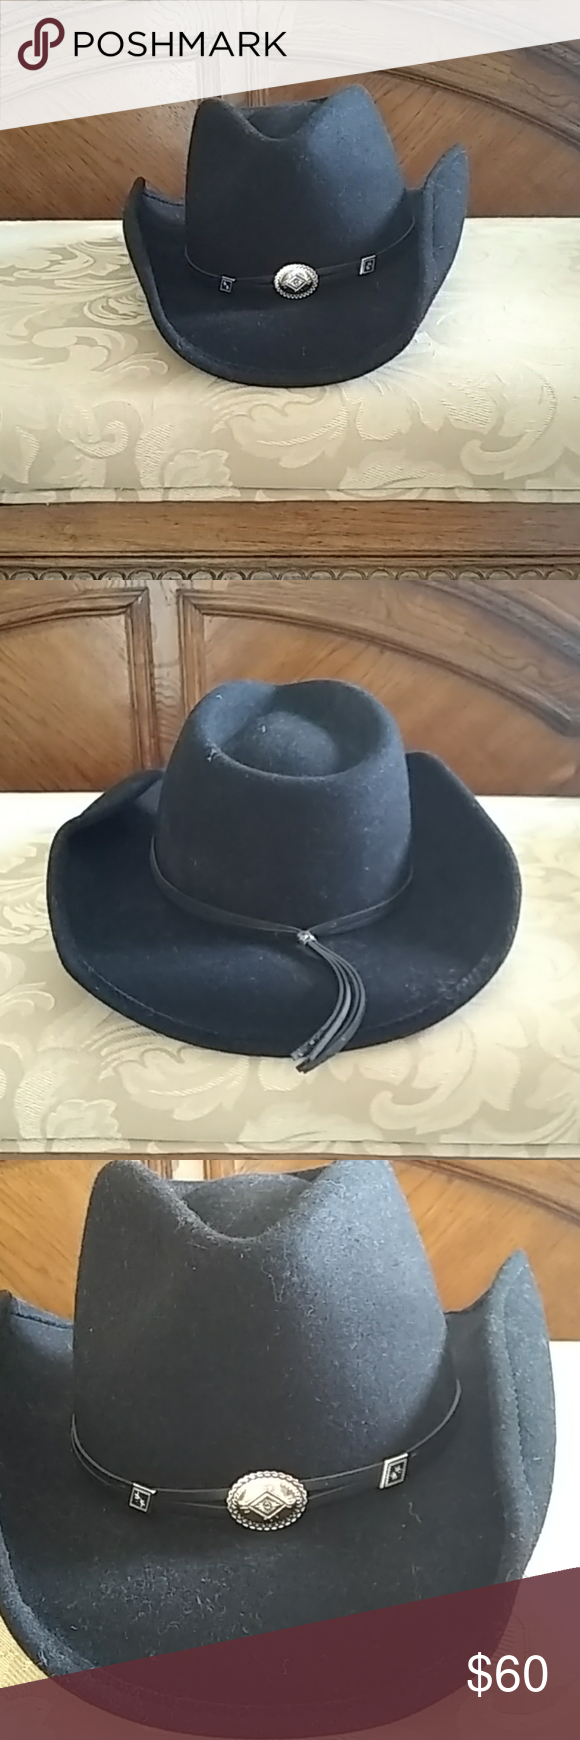 Gorgeous Stetson Hat Stetson Hat Cowgirl Hats Stetson